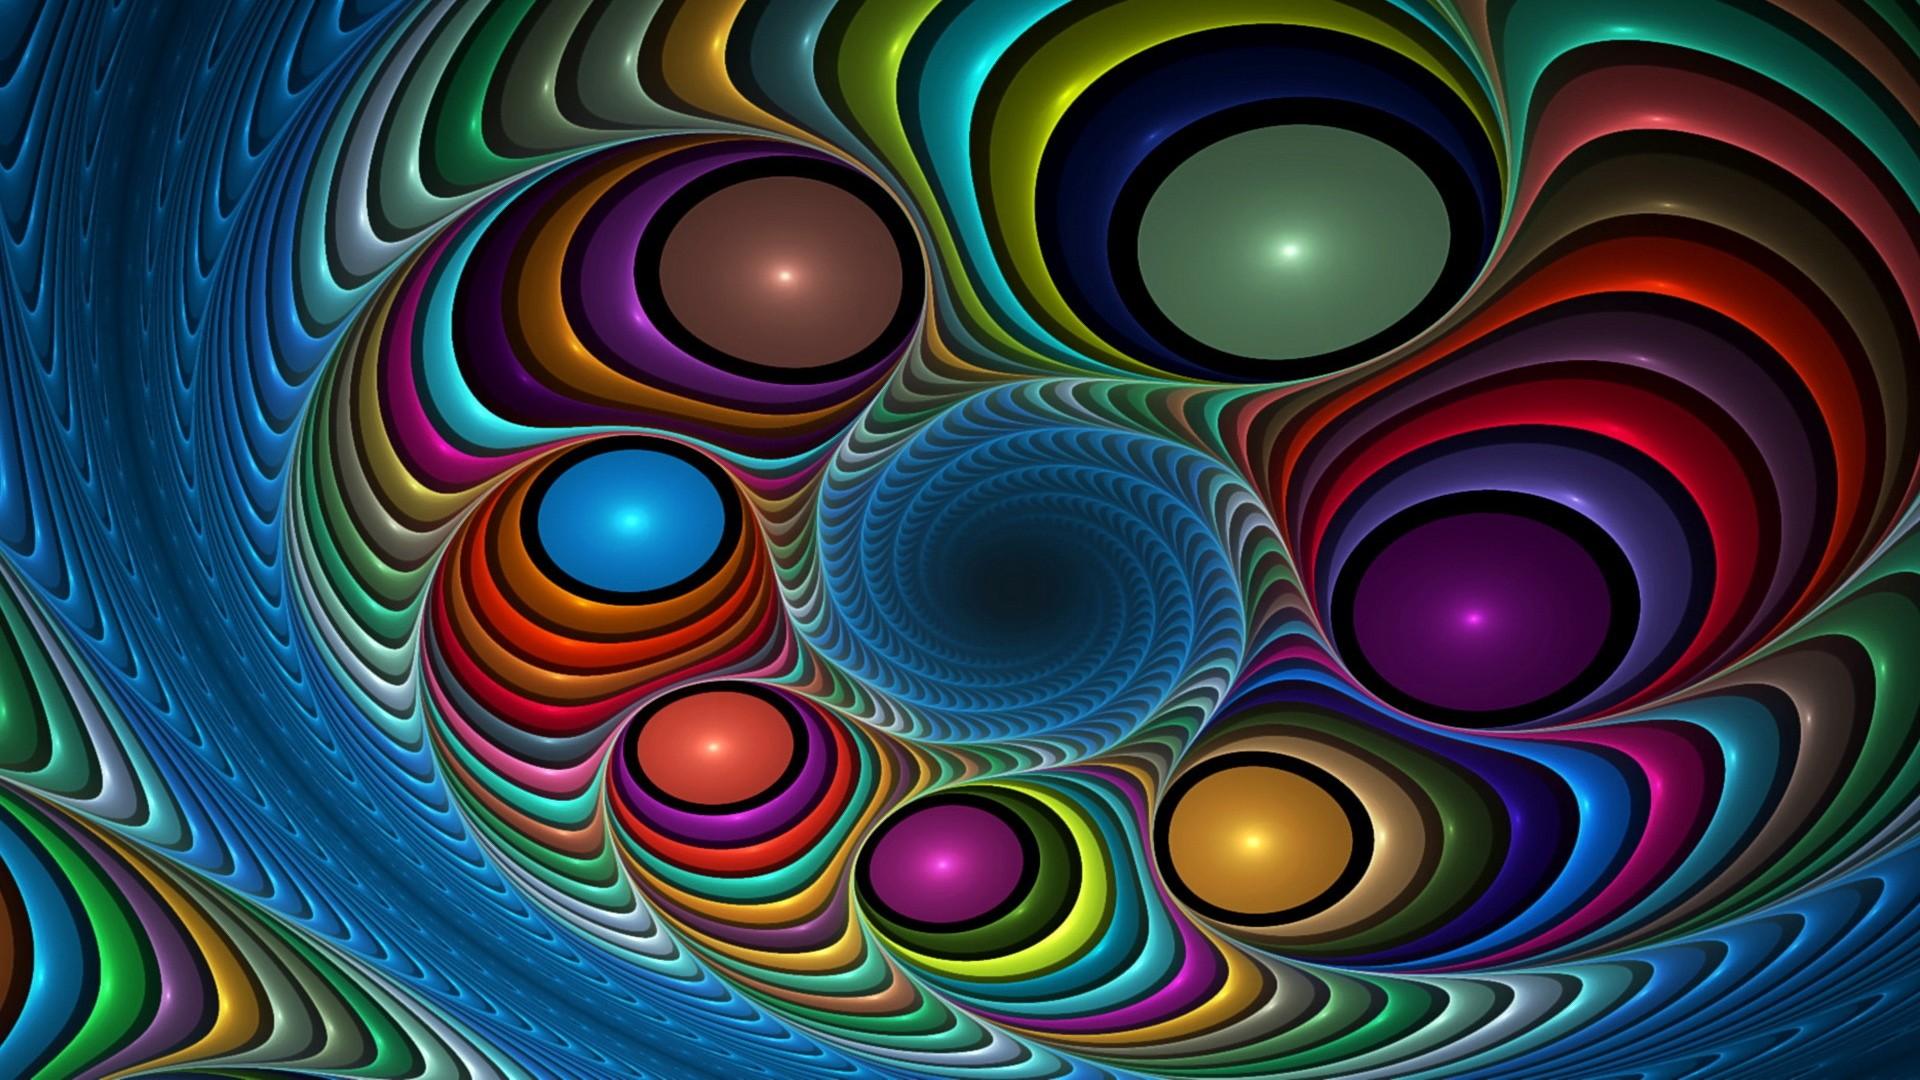 Chaos Wallpaper Hd Fractal Hd Wallpaper 75 Images